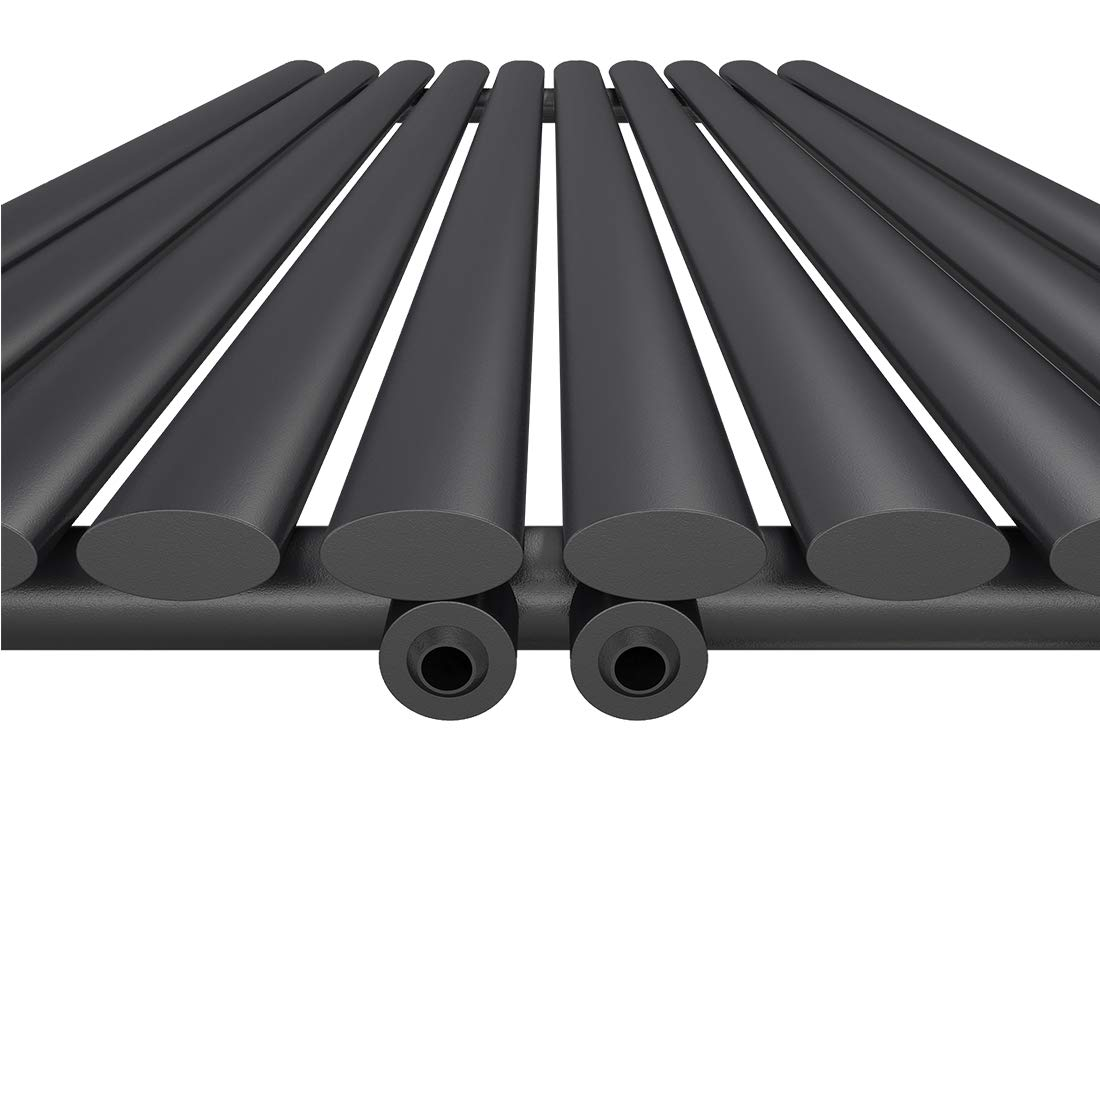 Heizk/örper Design-Heizk/örper Wei/ß Vertikal 1800x480mm Heizung Mittelanschluss Doppellagig